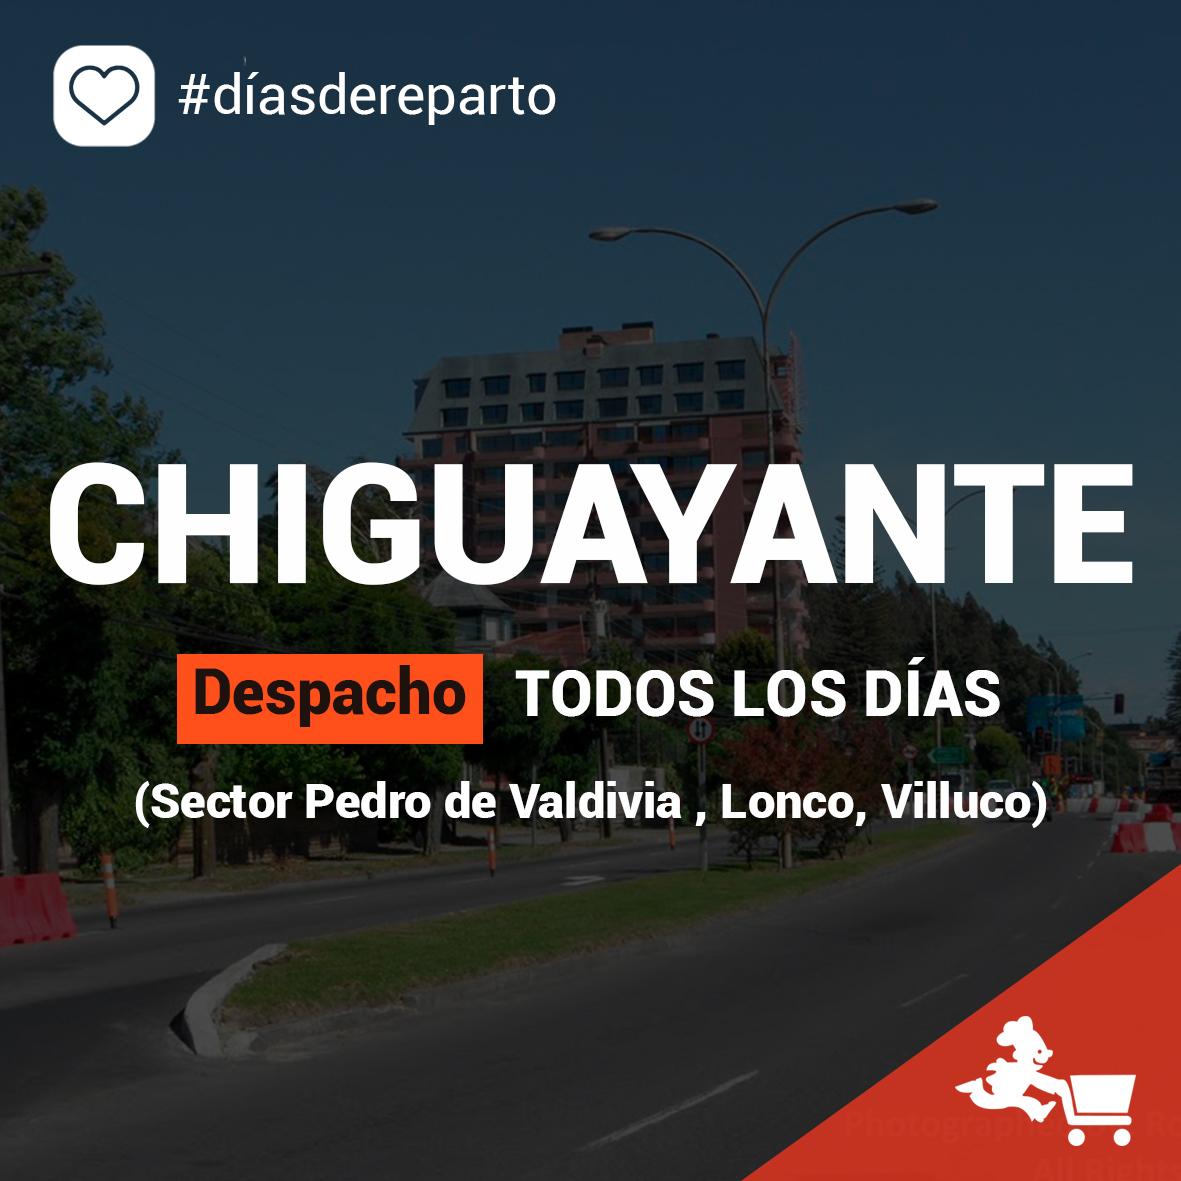 chiguayante